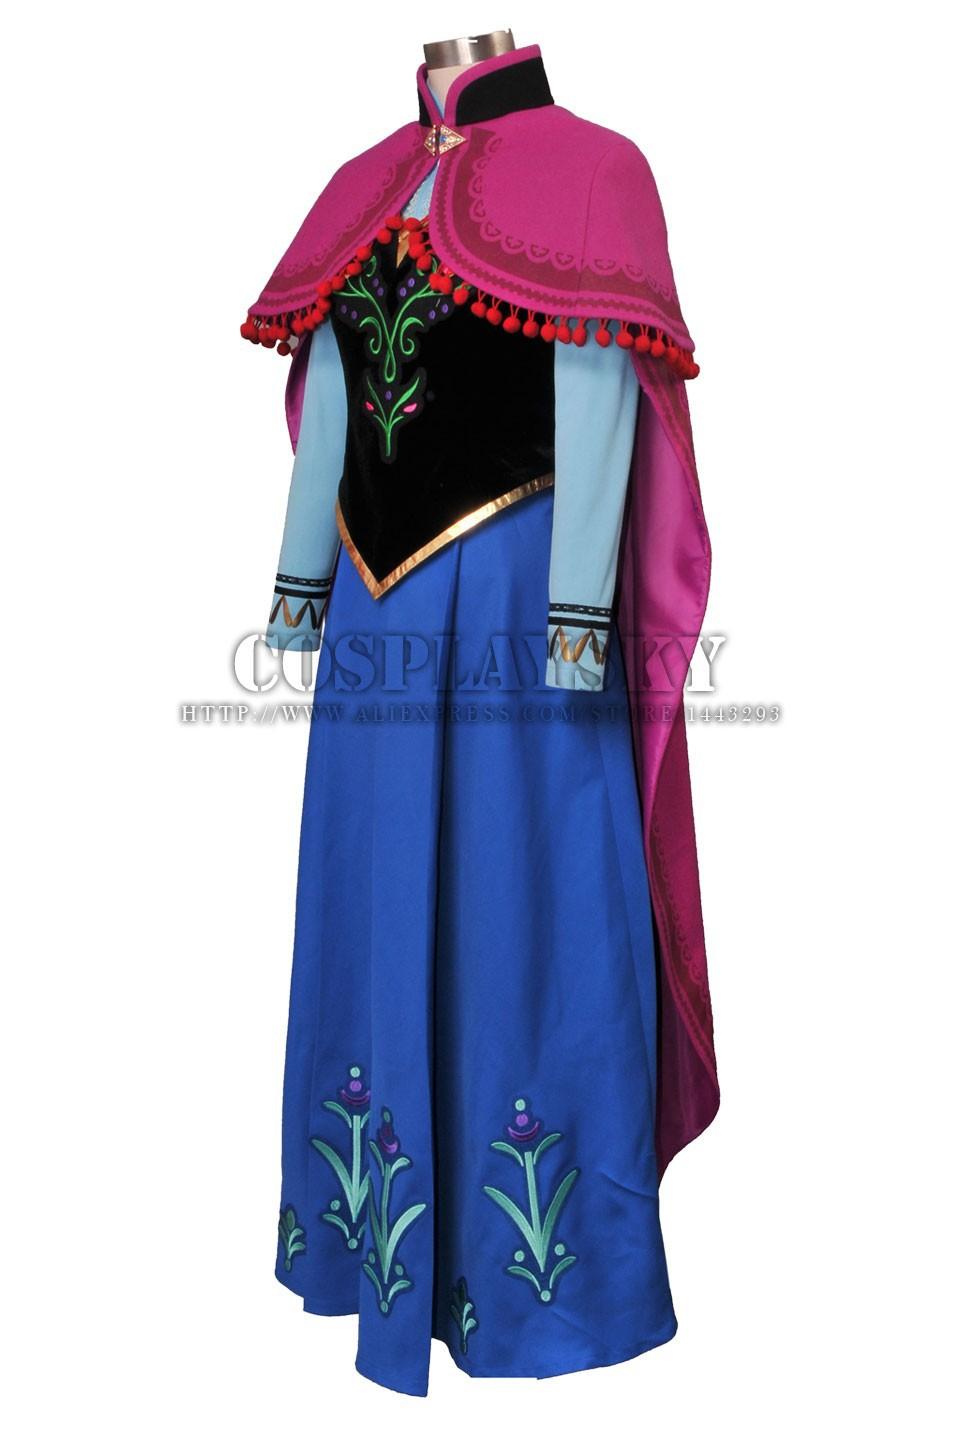 Frozen Anna Cosplay Costume Princess Anna Costume Set_02